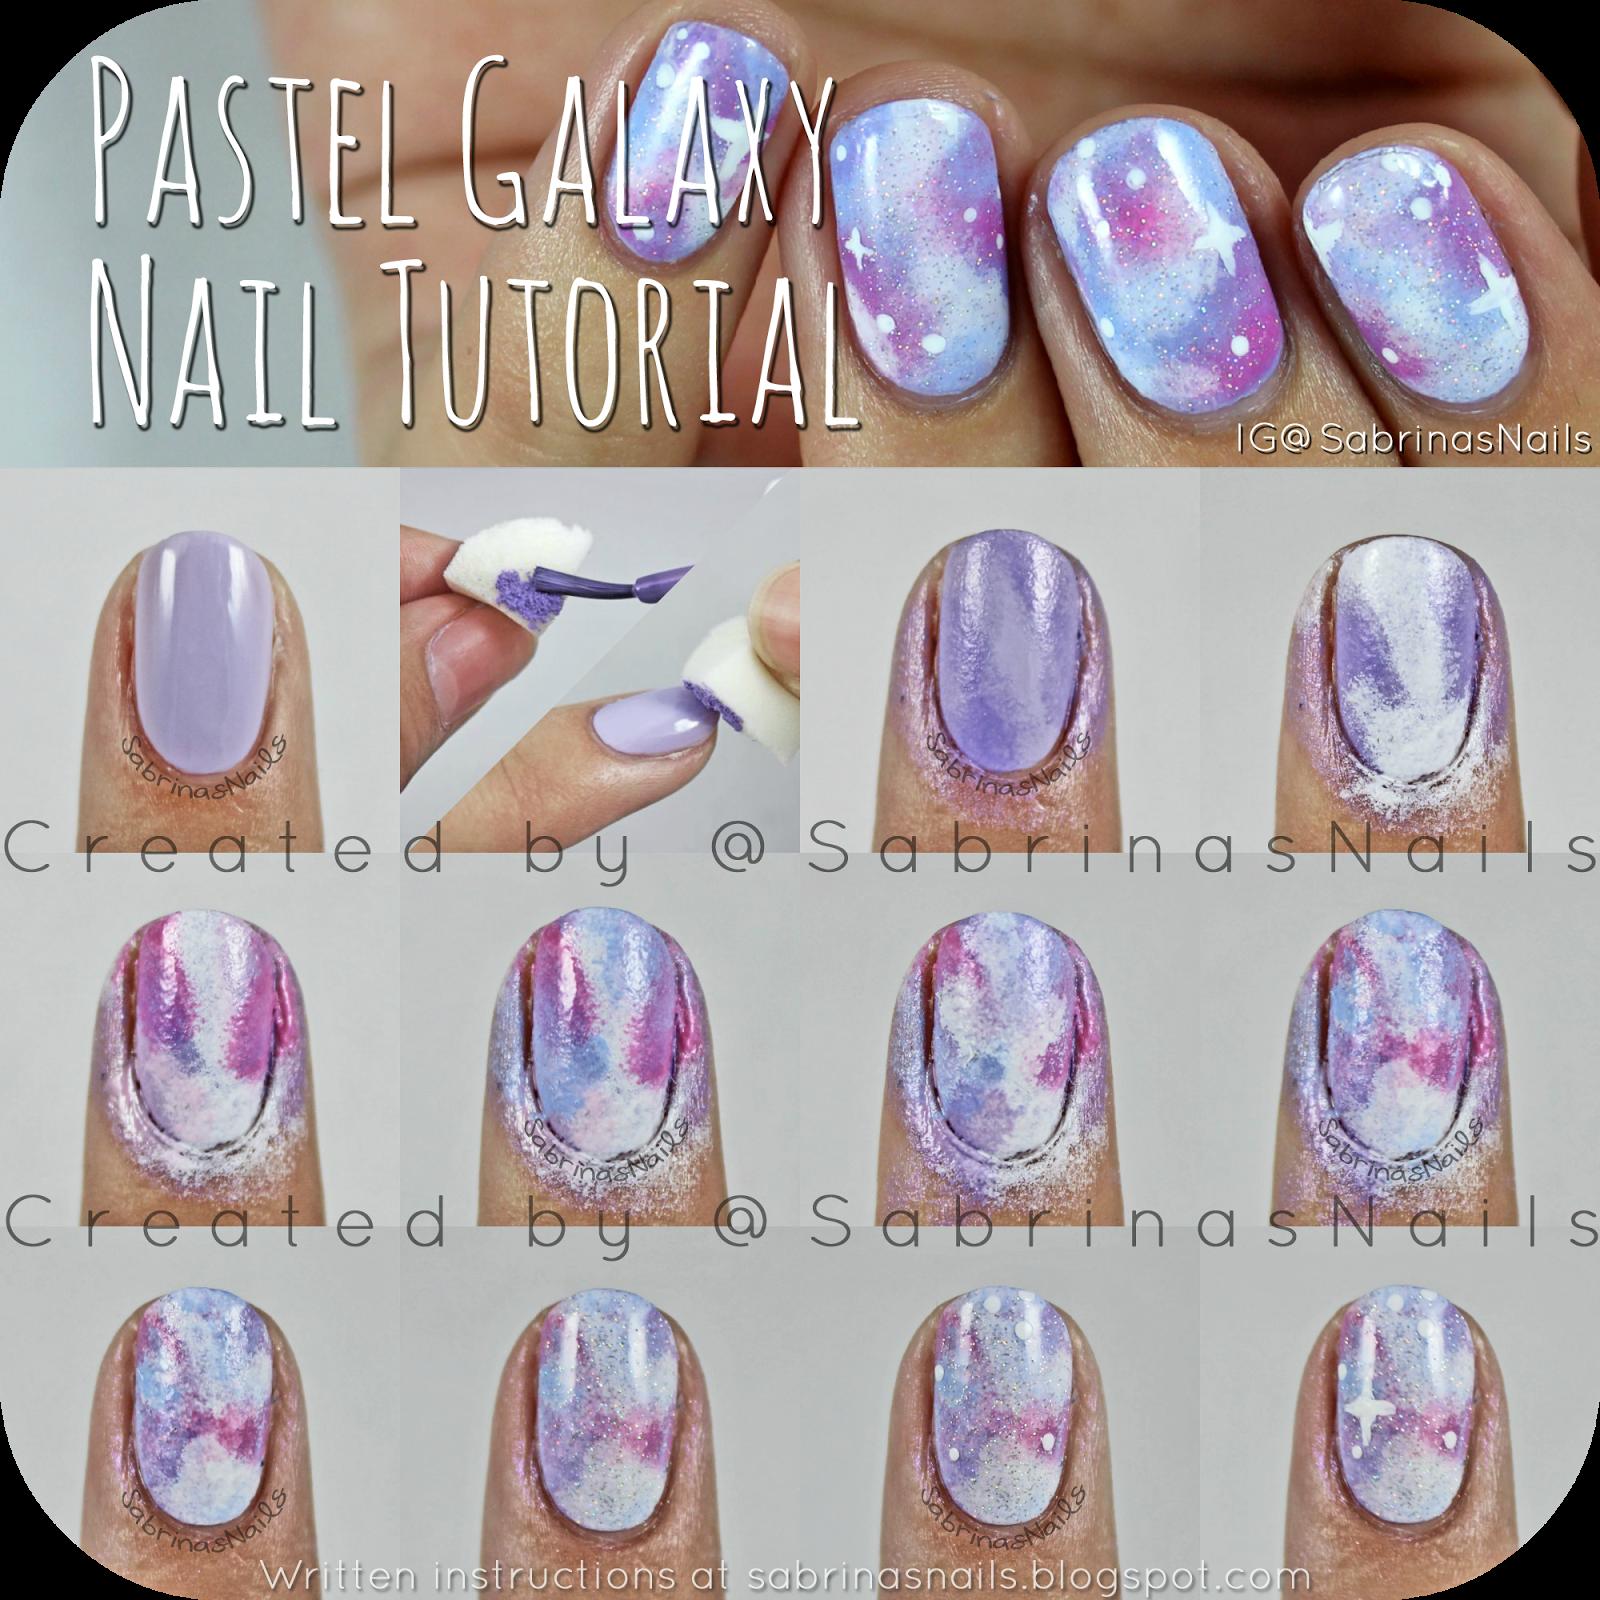 Unicorn Pastel Galaxy Nail Tutorial - Nails | Pinterest - Nagel ...